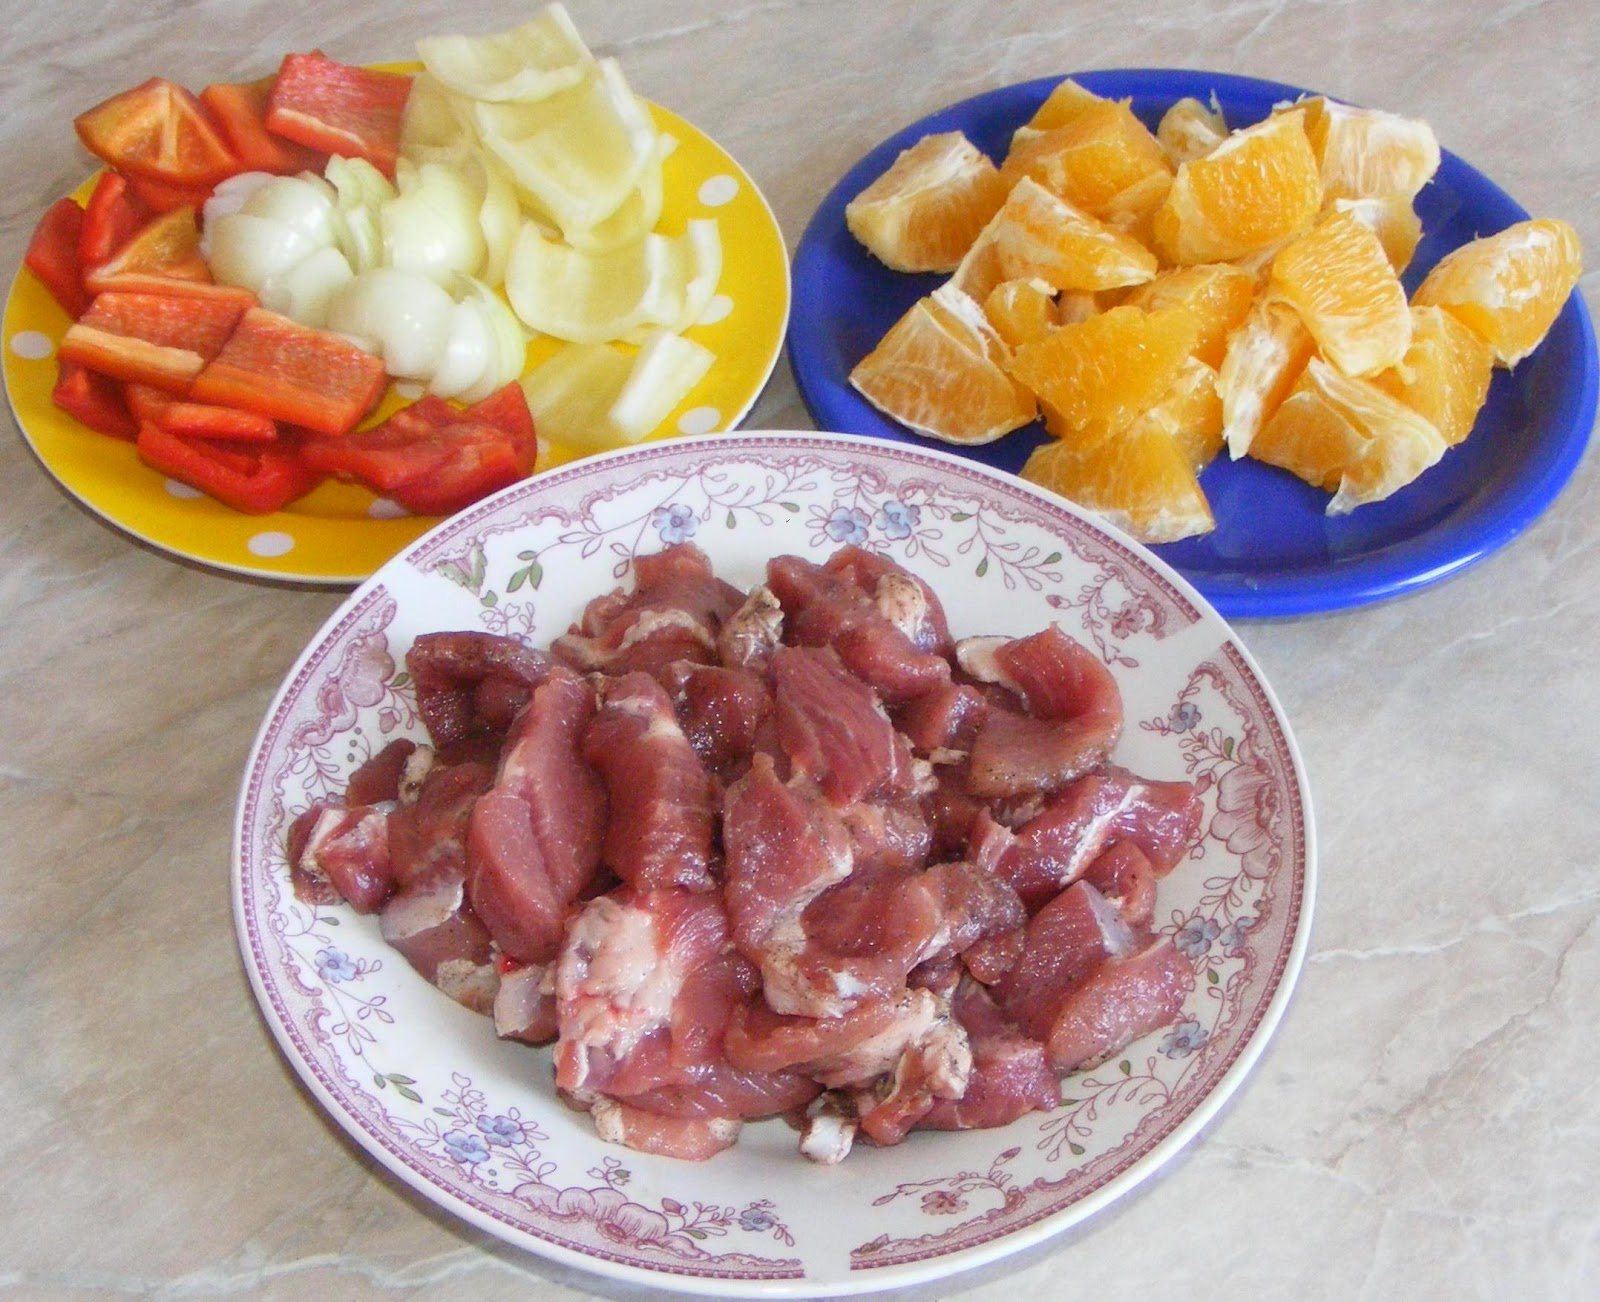 ingrediente frigarui, ingrediente pentru frigarui, cum se prepara frigarui, cum facem frigarui, retete gratar, retete gril, retete culinare, preparate culinare, retete de mancare,